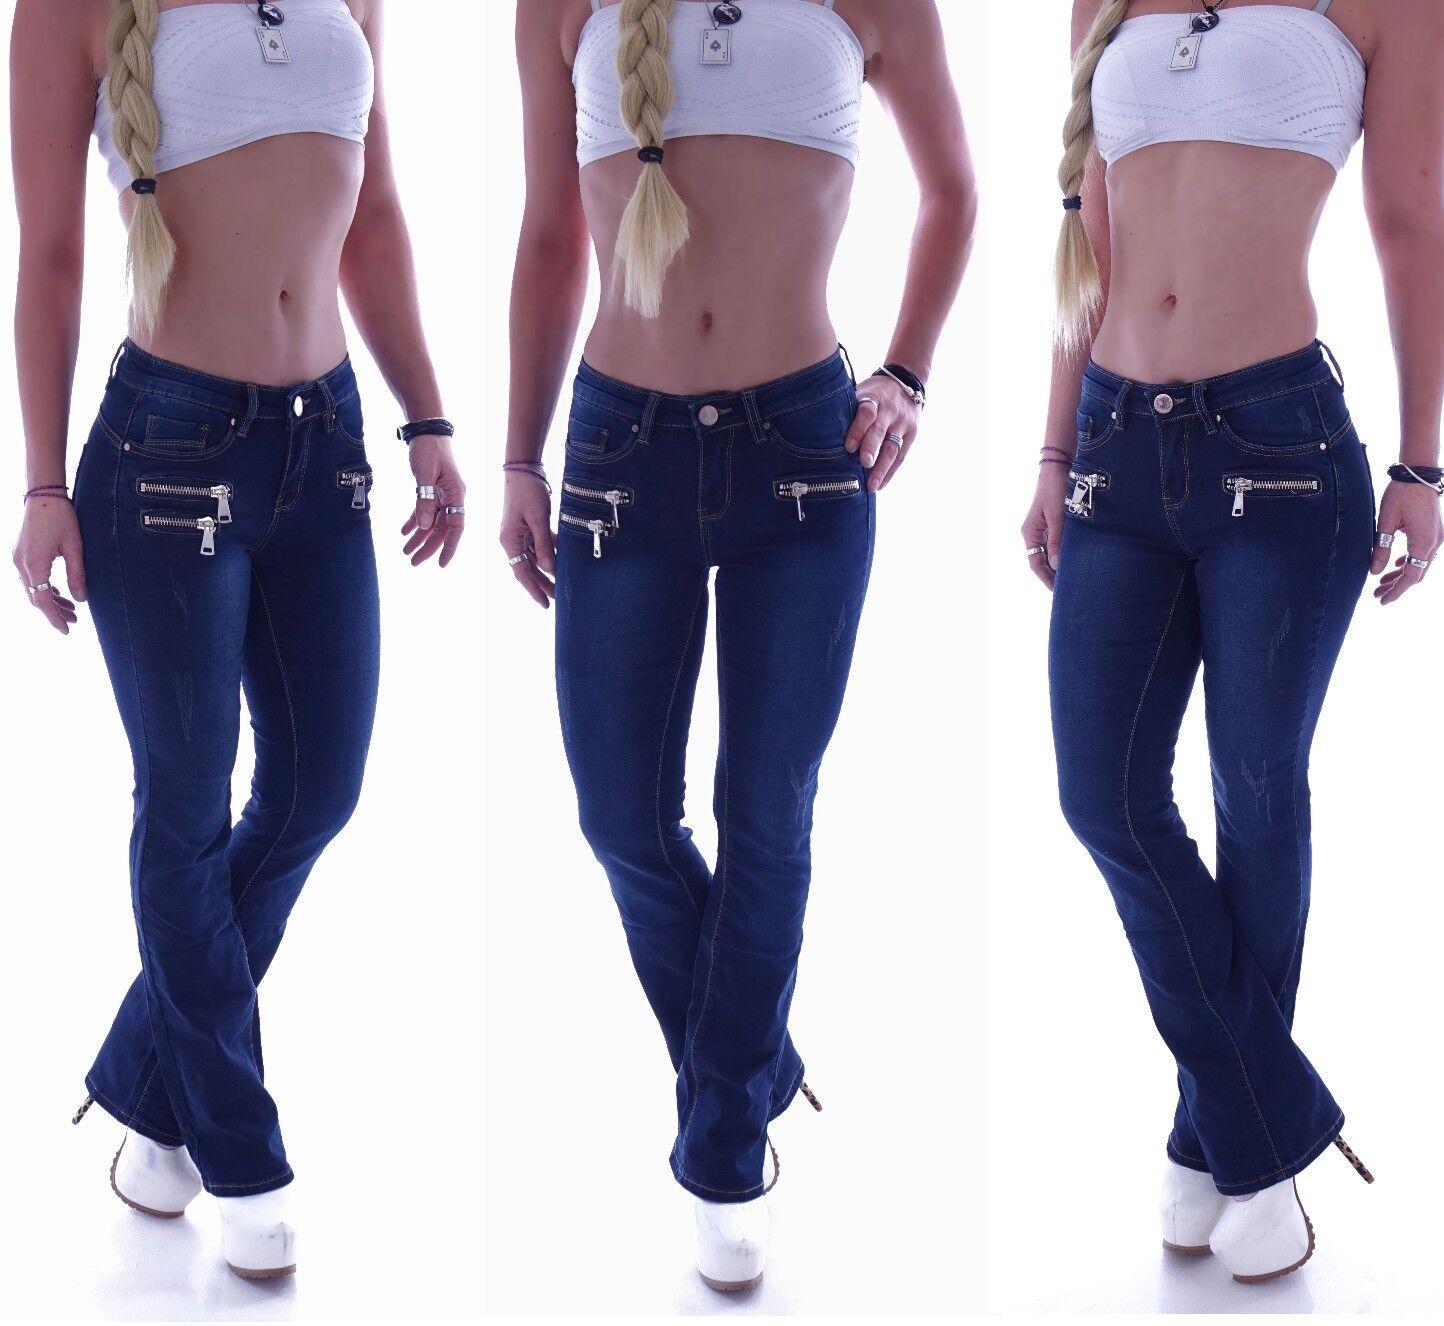 Damen Bootcut Jeans Schlag Hose Hüftjeans Blau Sexy Damenjeans Marlene D56